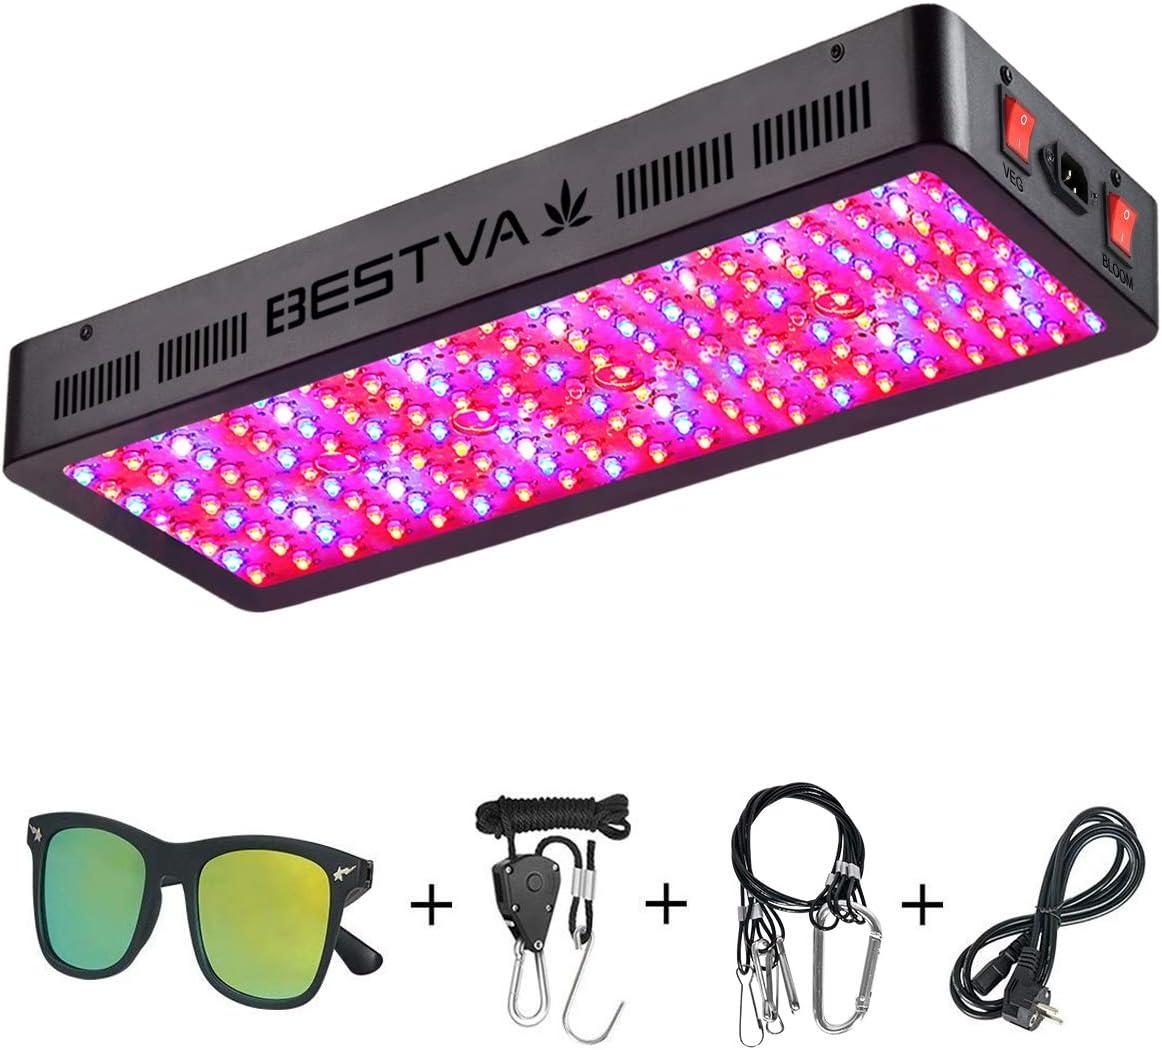 BESTVA DC Series 2000W LED Grow Light